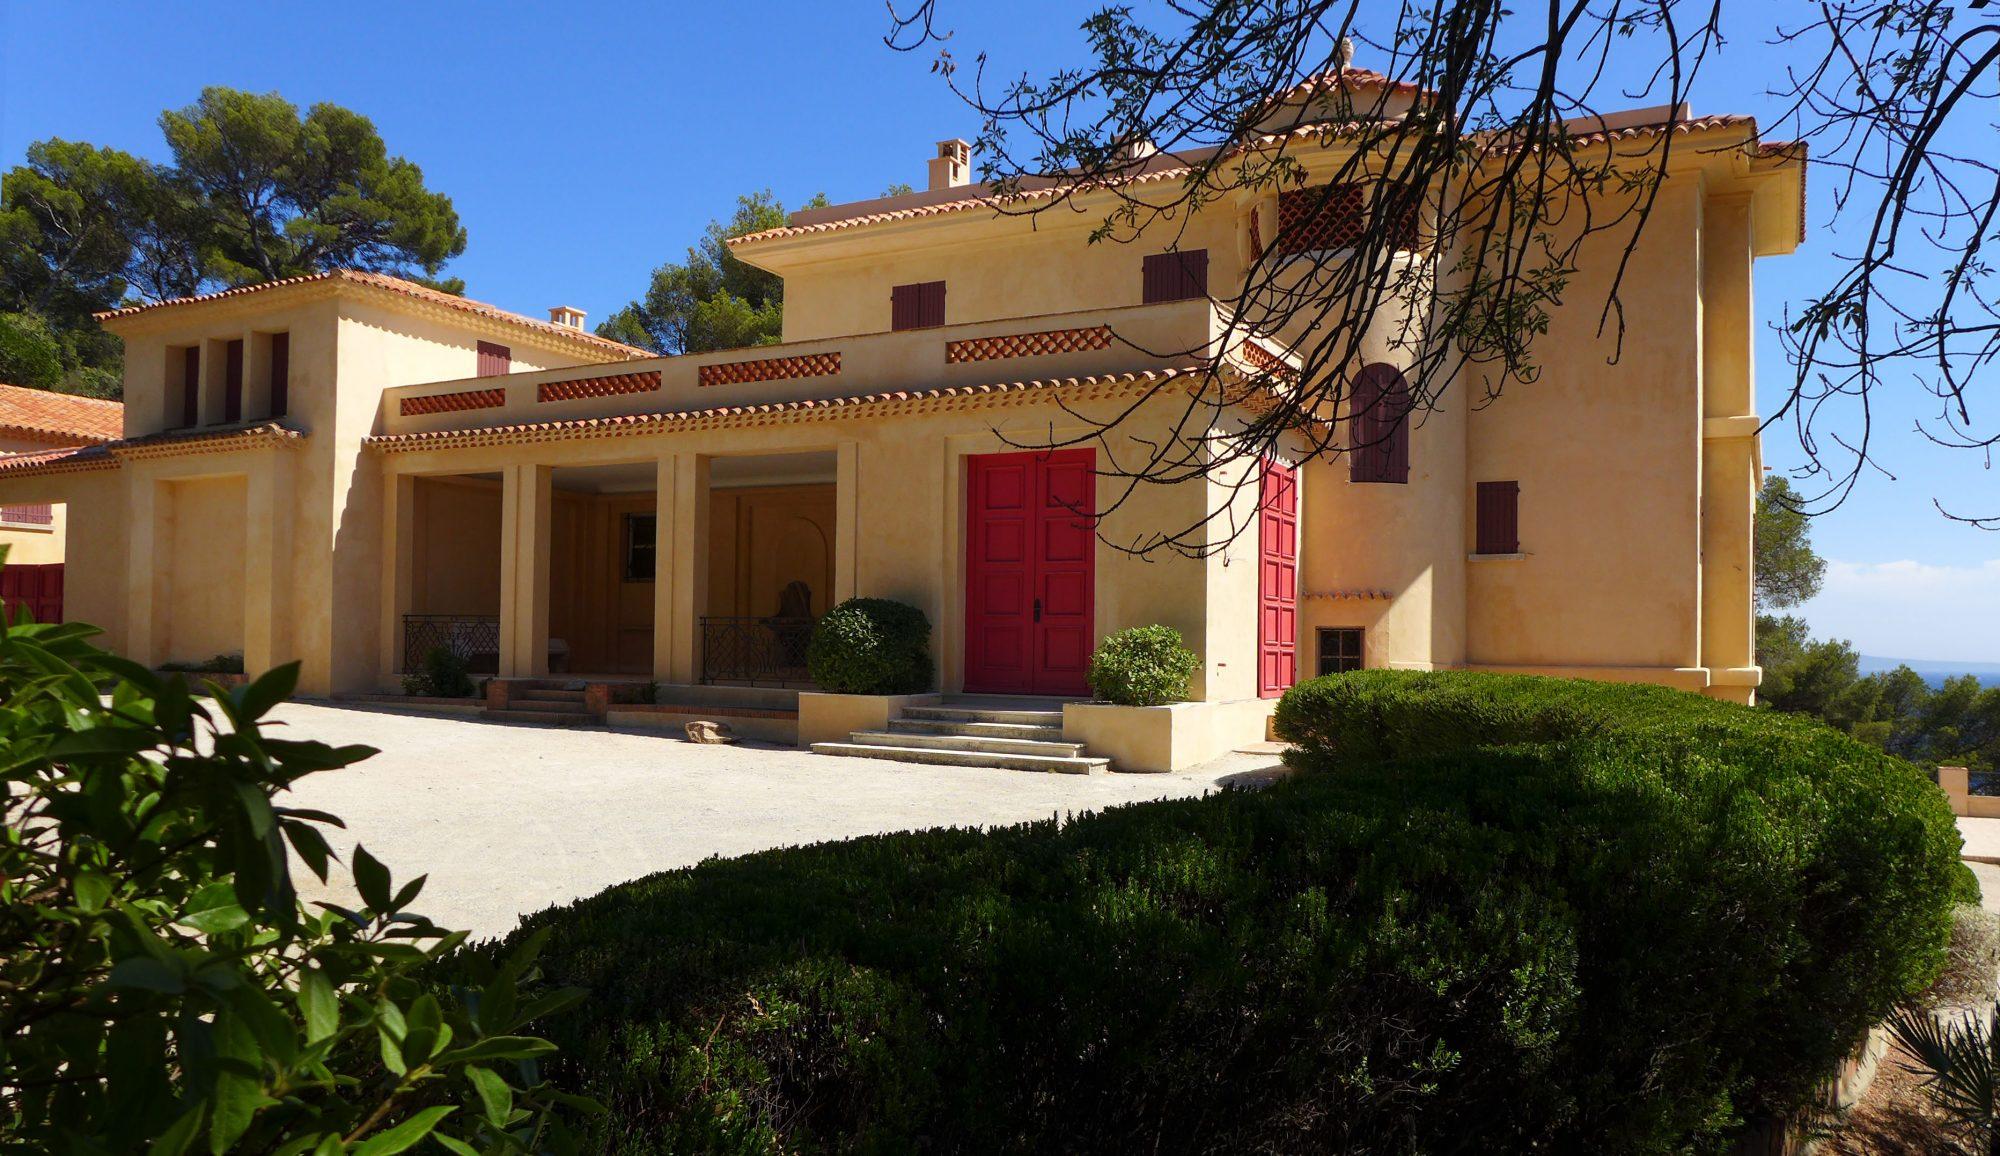 Domaine du rayol karine soton domaine du rayol for Villa du jardin wedding